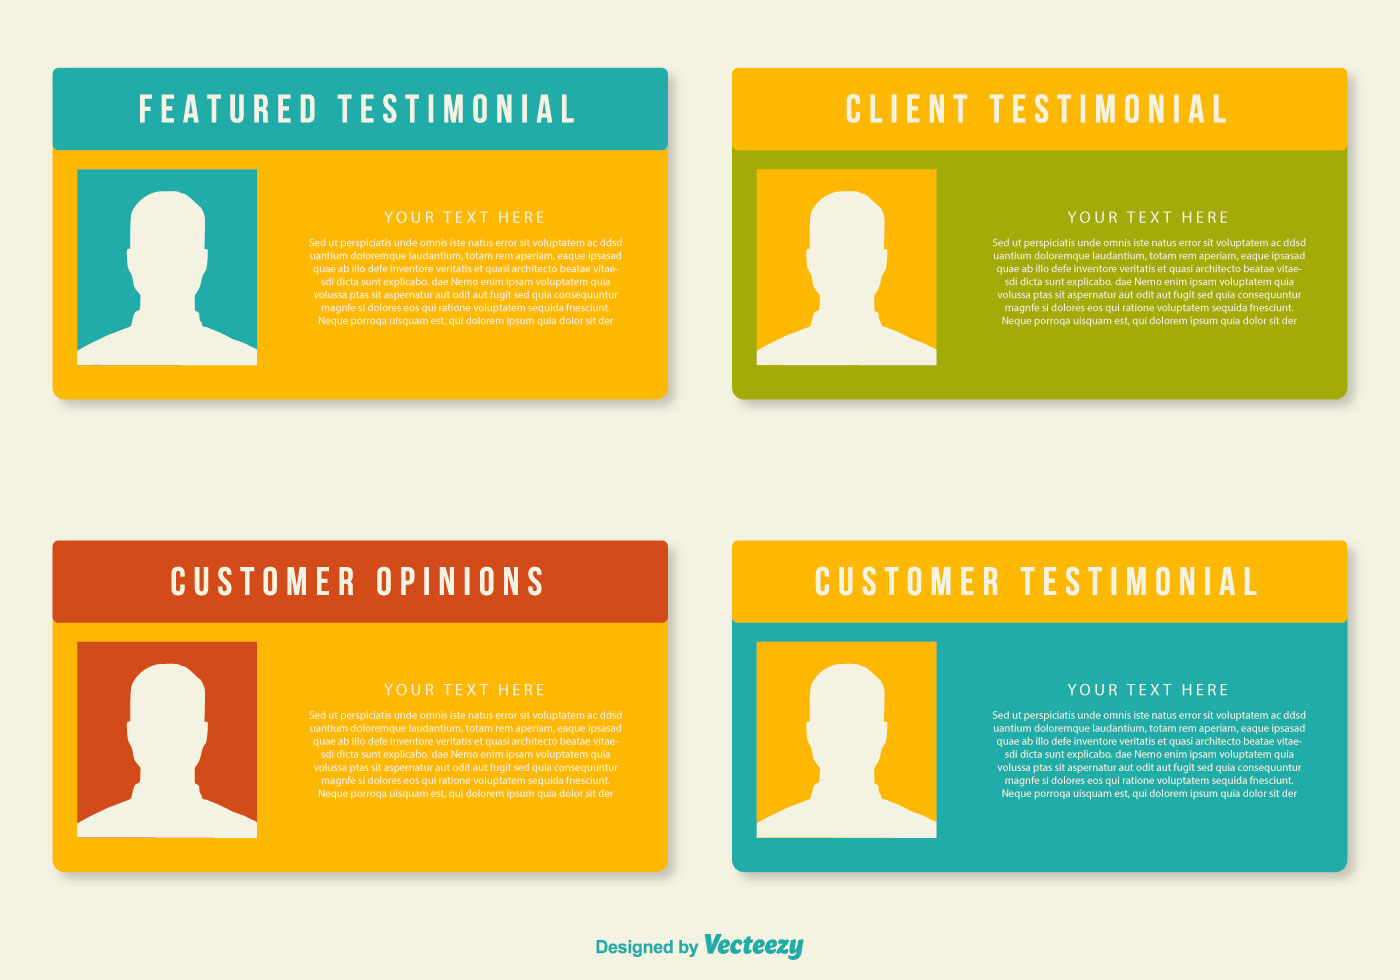 customer testimonial templates